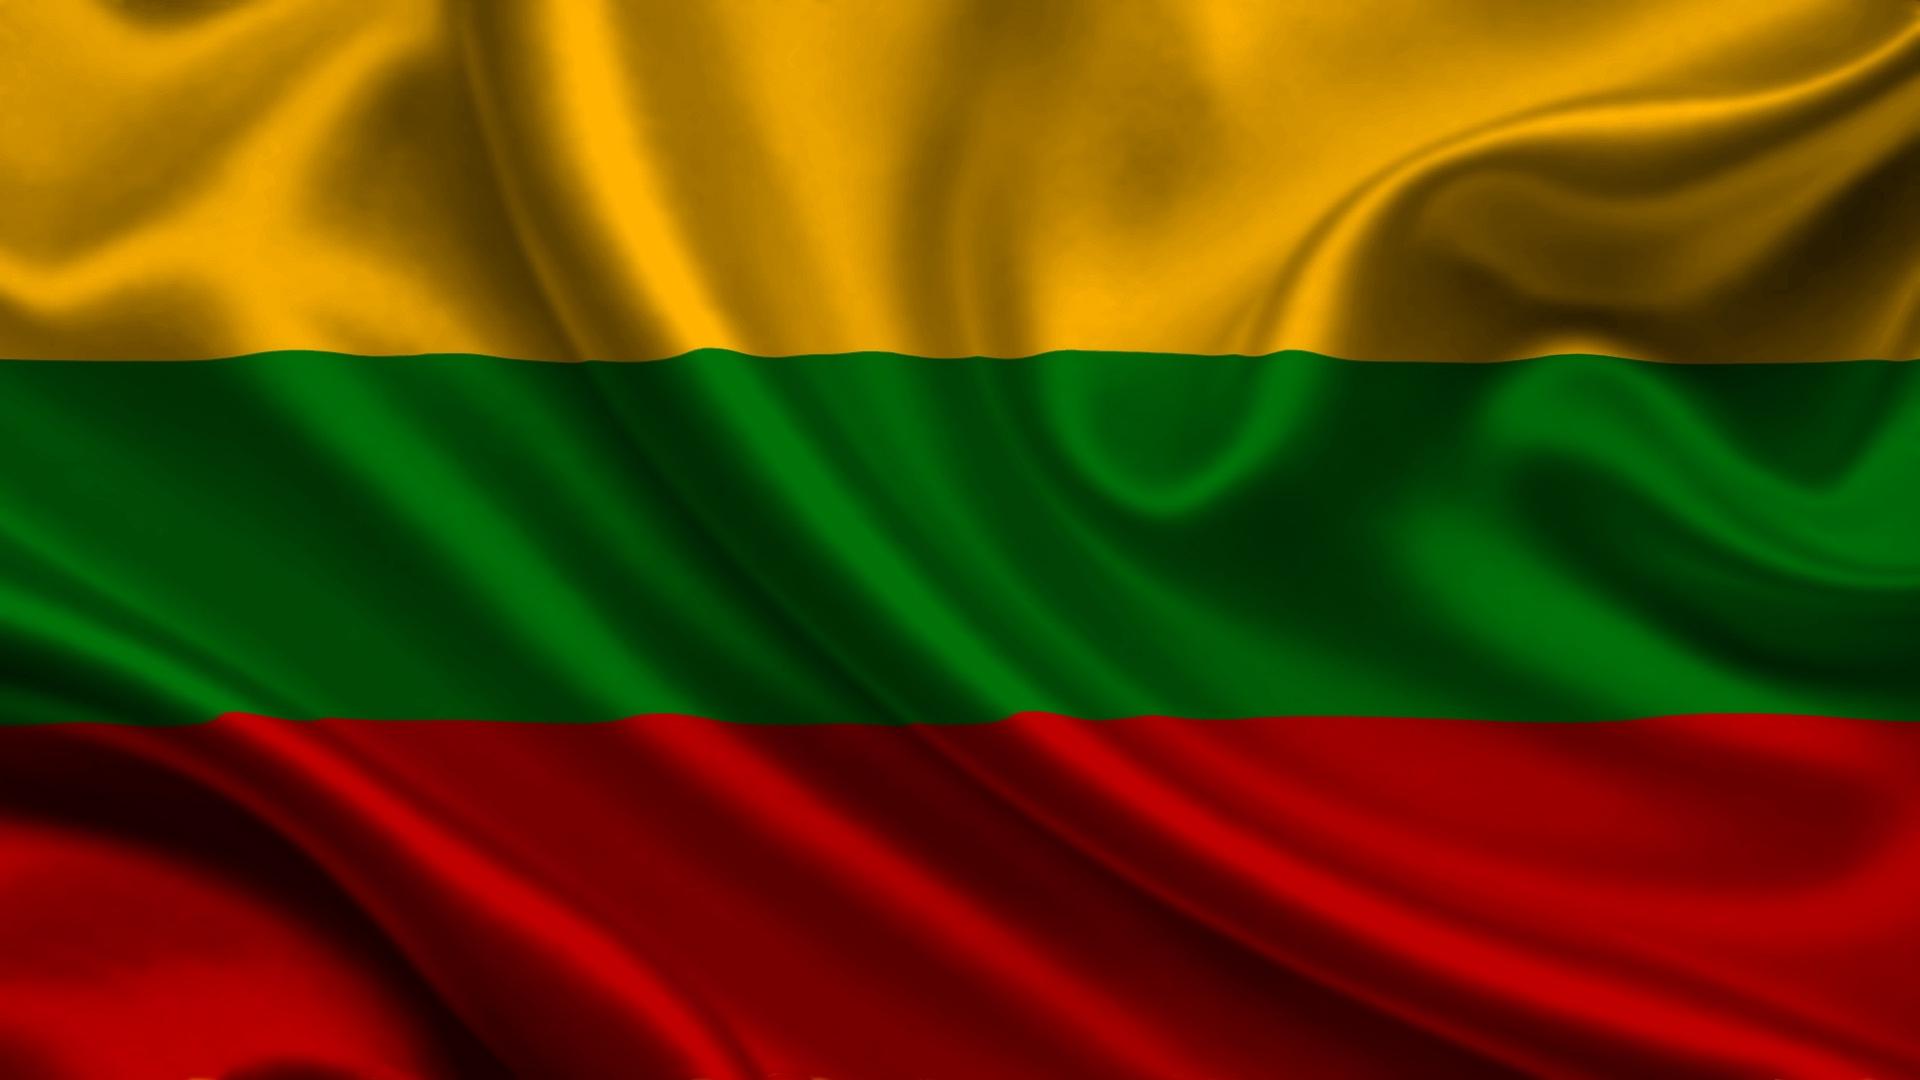 Lithuania Satin Flag Stripes Symbols   Stock Photos Images 1920x1080